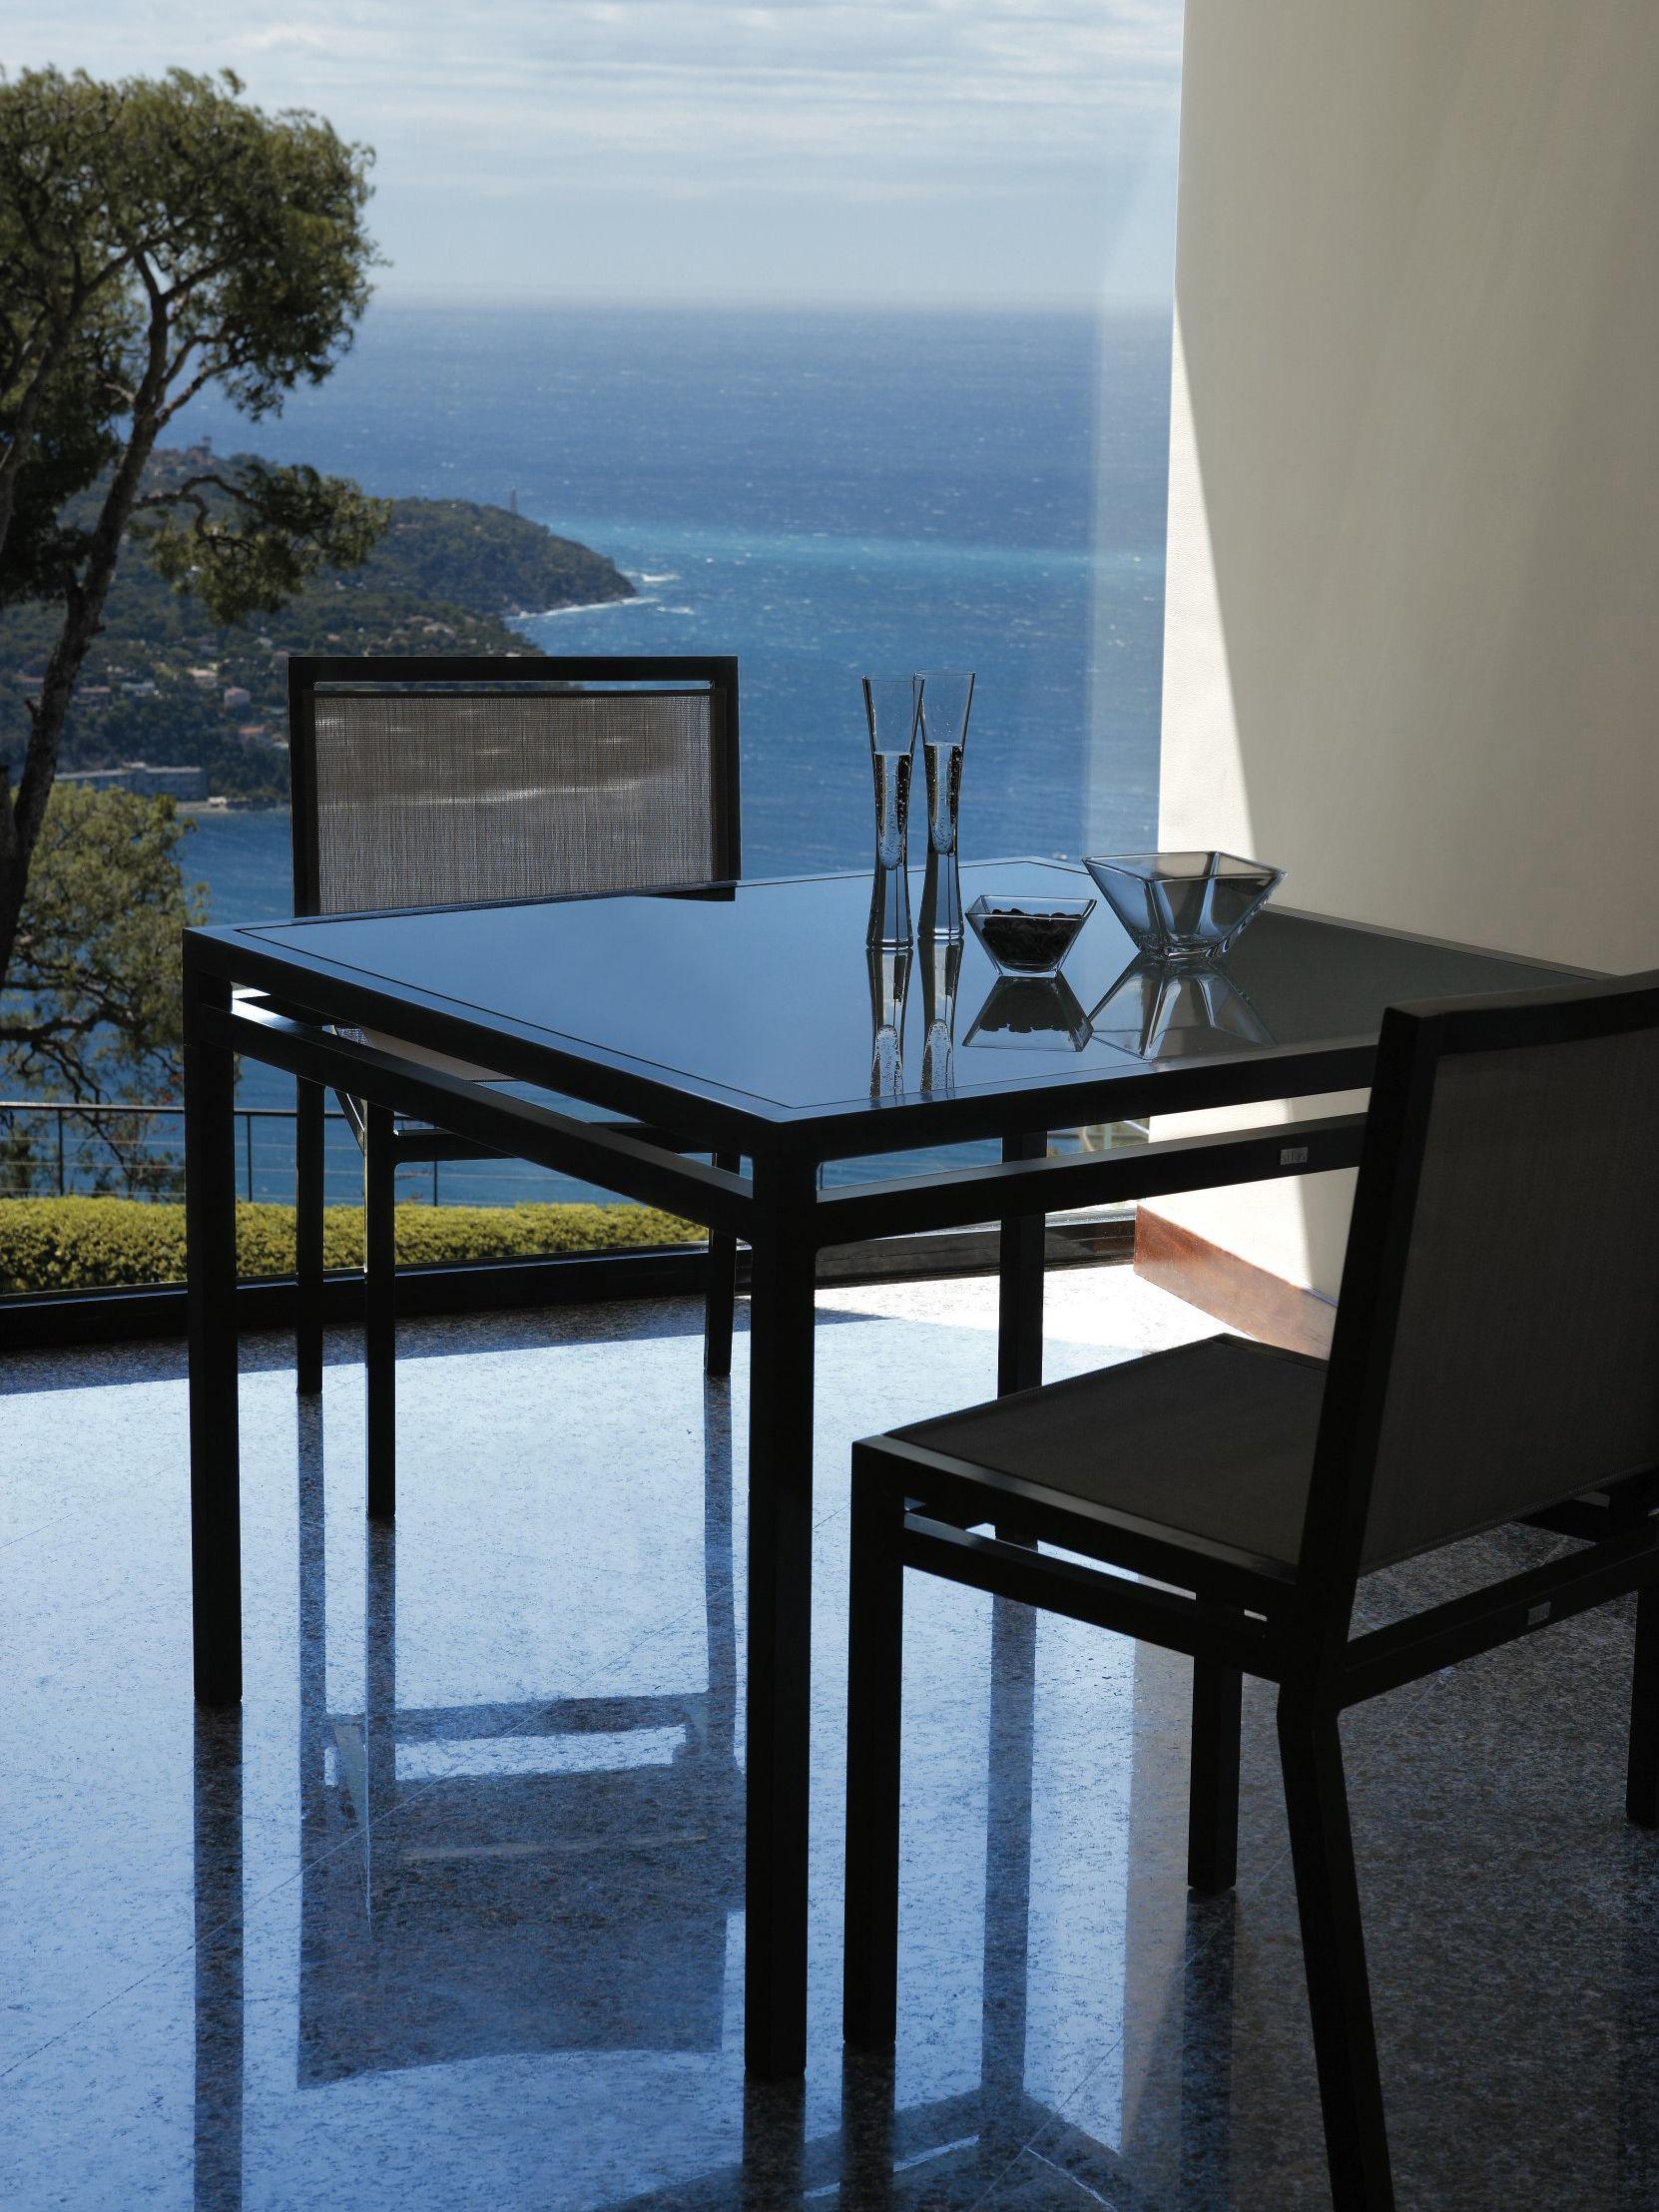 Scopri sedia kare free original tela talpa struttura for Kare arredamento